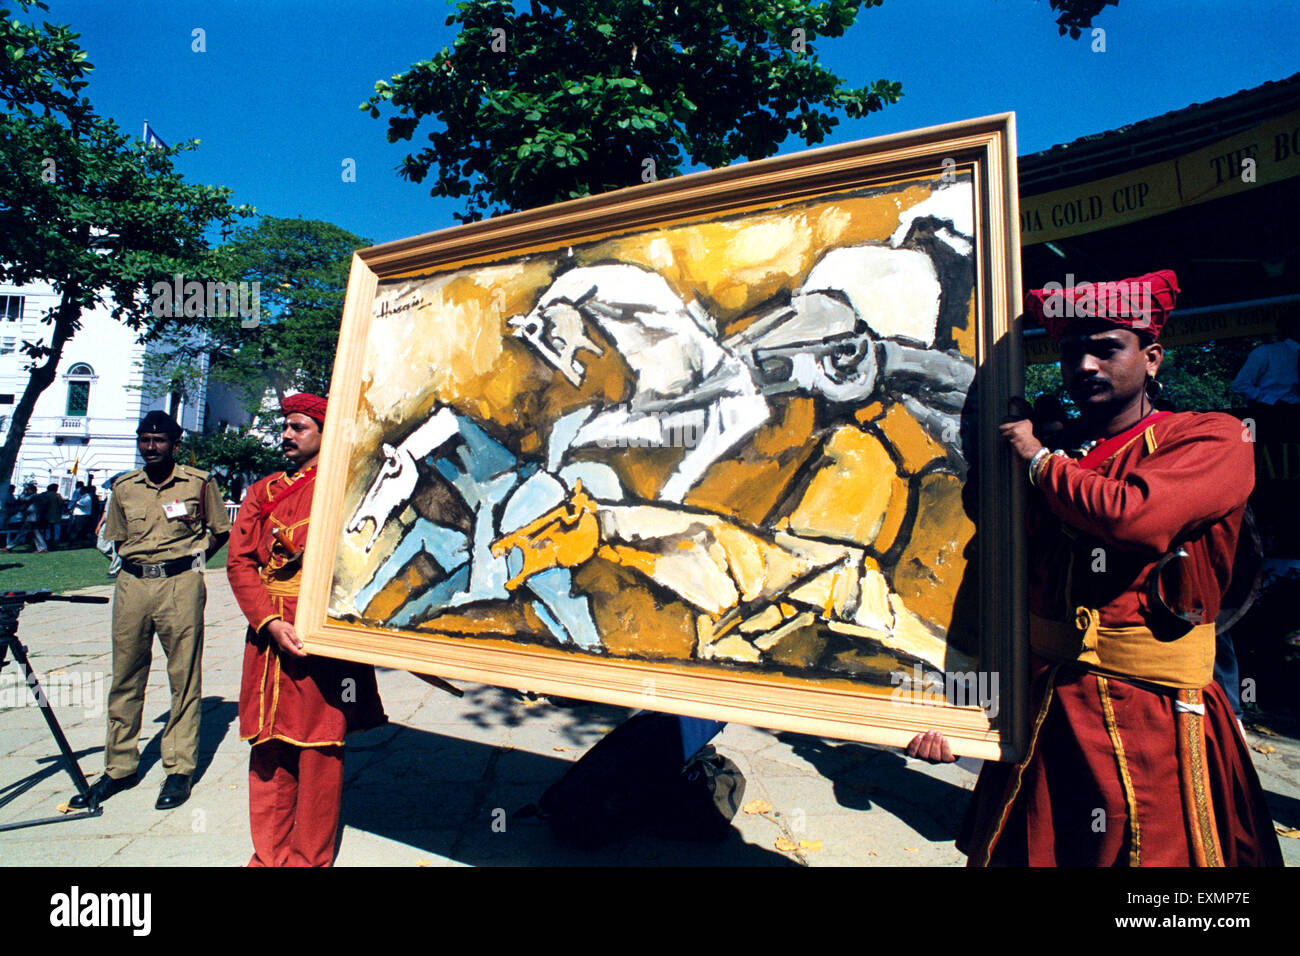 Maqbool Fida Husain MF Husain modern Indian painter of international acclaim painting for auction mahalaxmi race - Stock Image